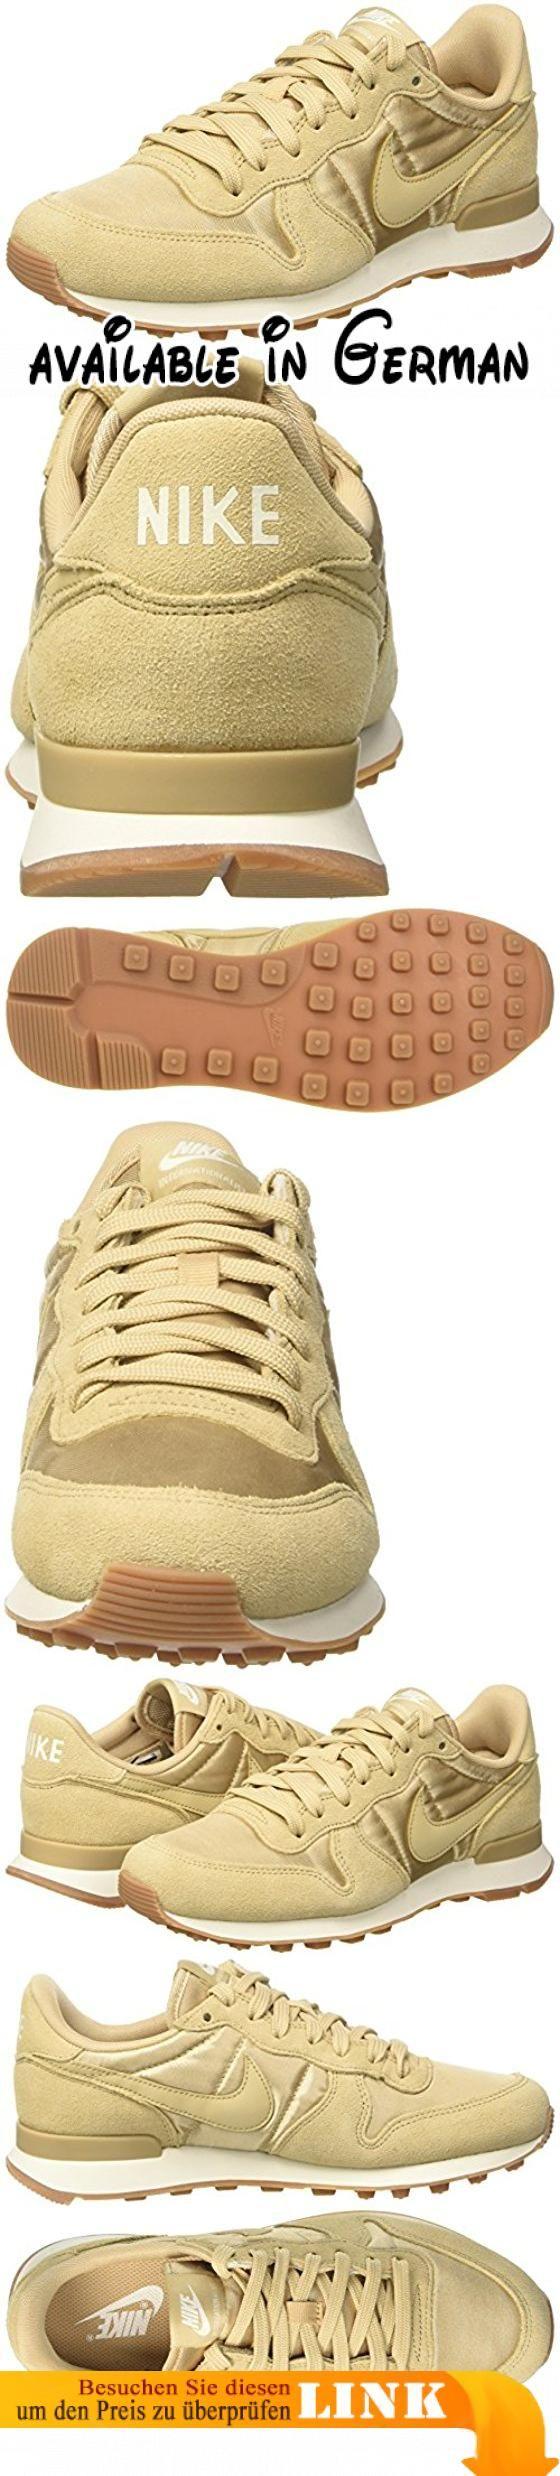 Nike Damen Wmns Internationalist Low-Top, Beige (Linen/Linen/Sail), 37.5 EU. Obermaterial: Leder/Textil. Innenmaterial: Synthetik. Sohle: Gummi. Verschluss: Schnürsenkel. Schuhbreite: Normal #Shoes #SHOES